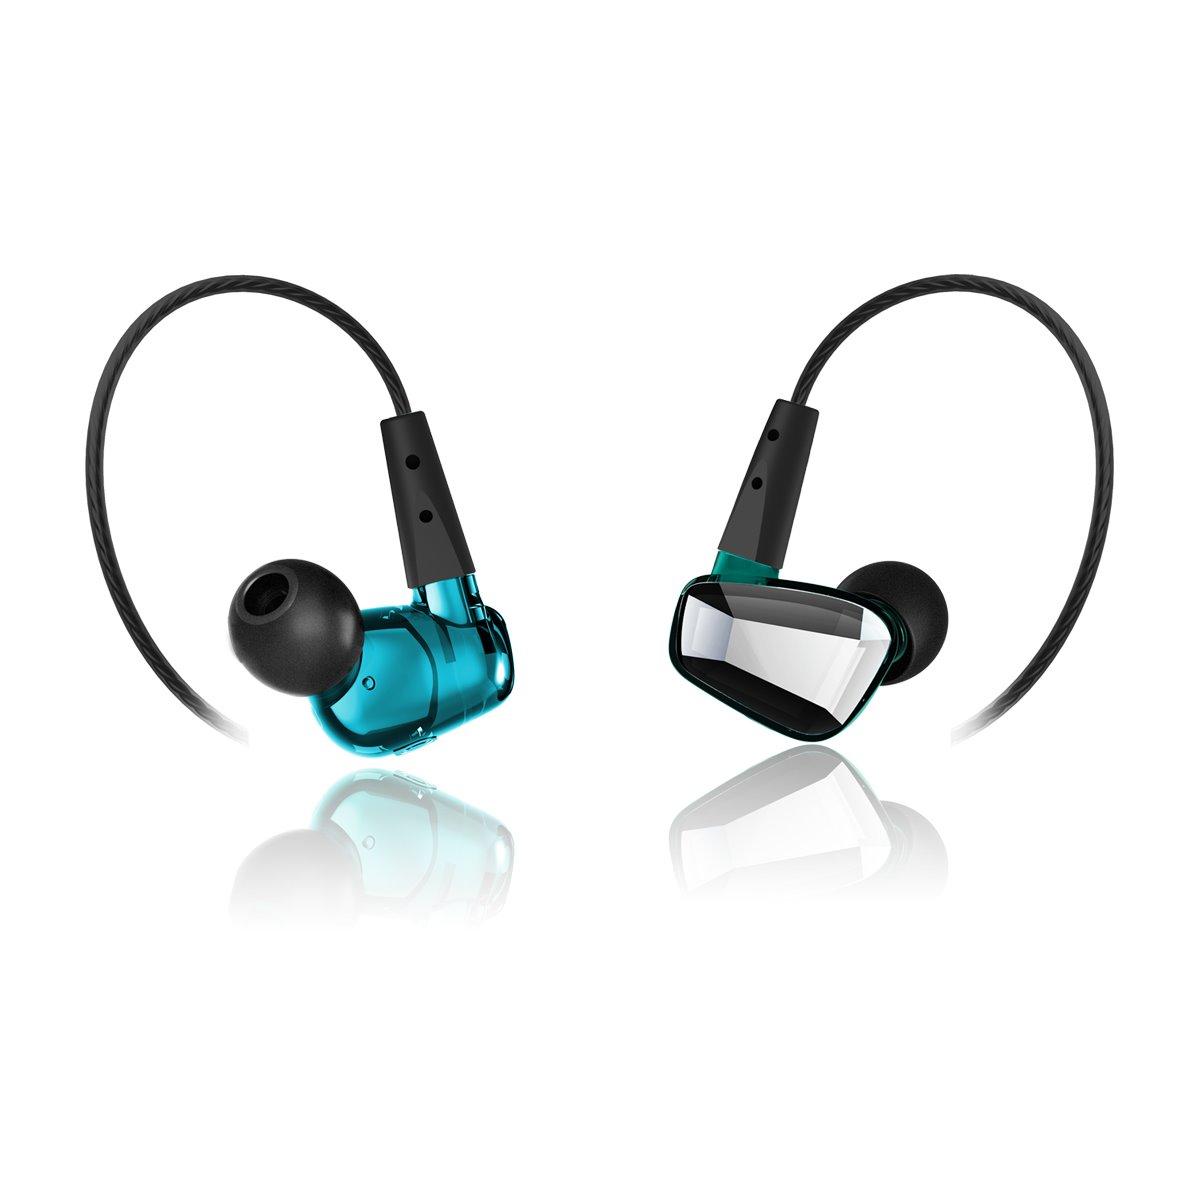 VINSIC Premium In-Ear Headphone 3.5mm Silver (EU Blister)